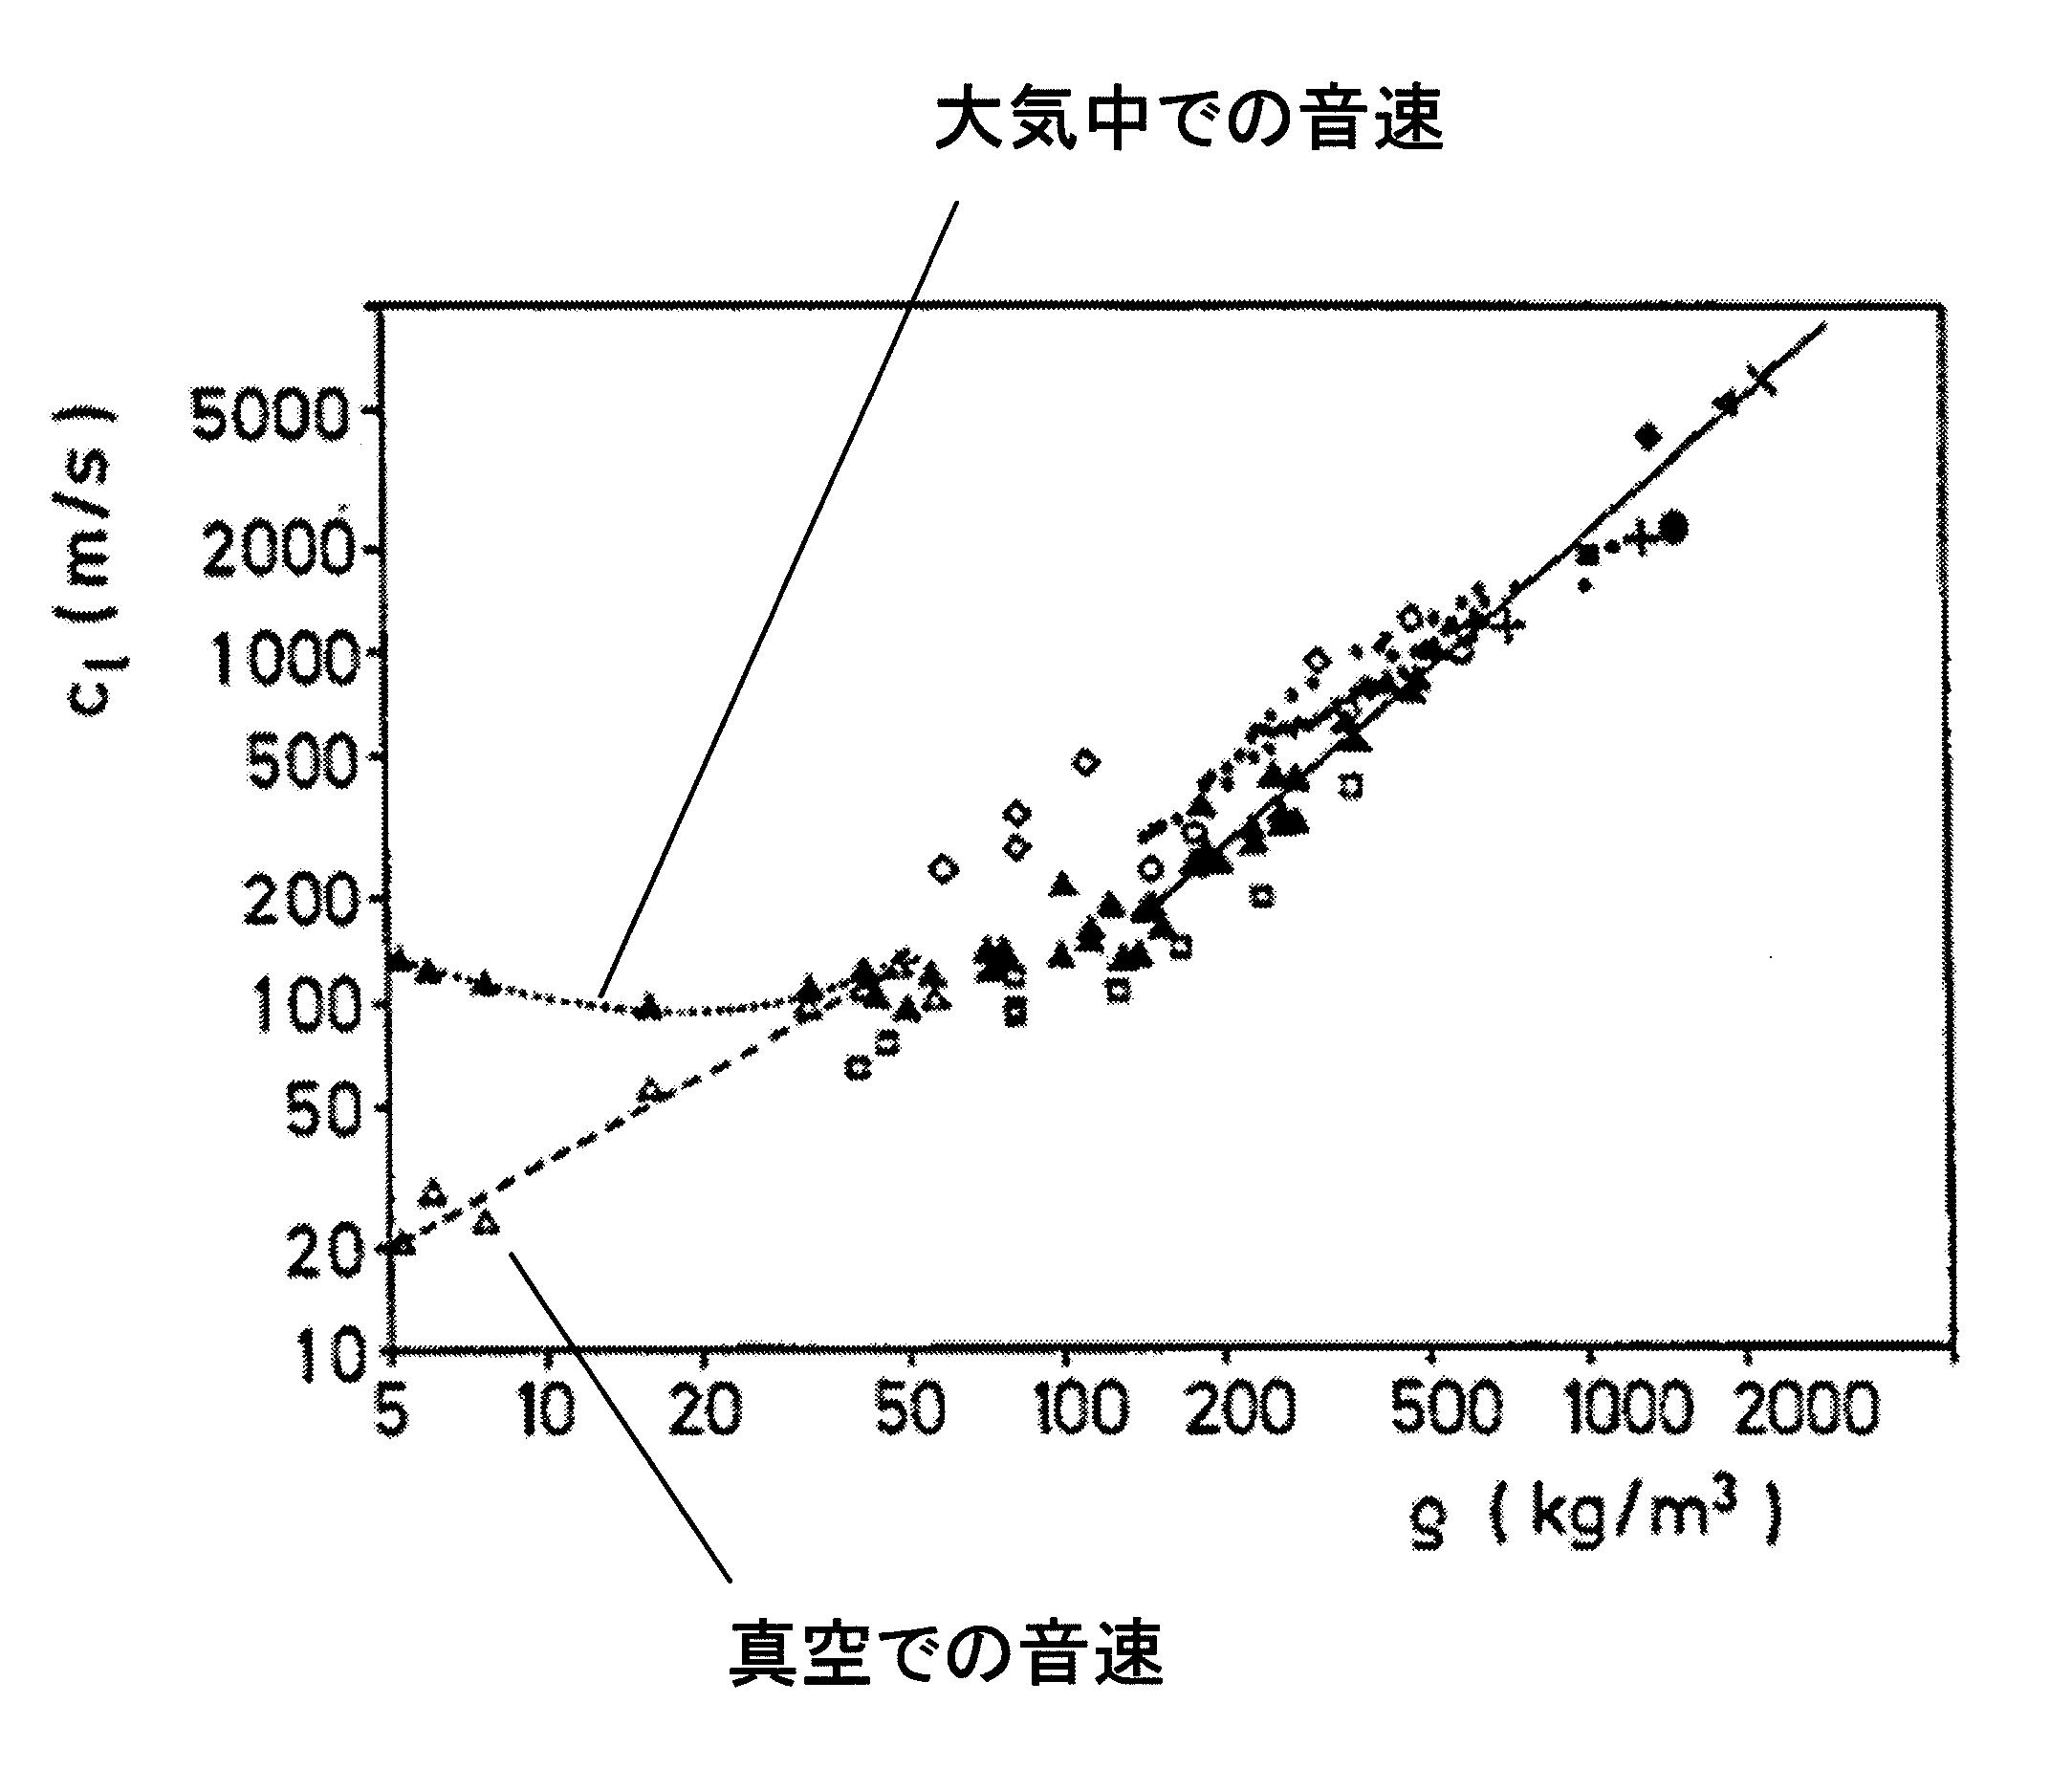 WO2012172733A1 - シリカ多孔体の製造方法         - Google PatentsFamily